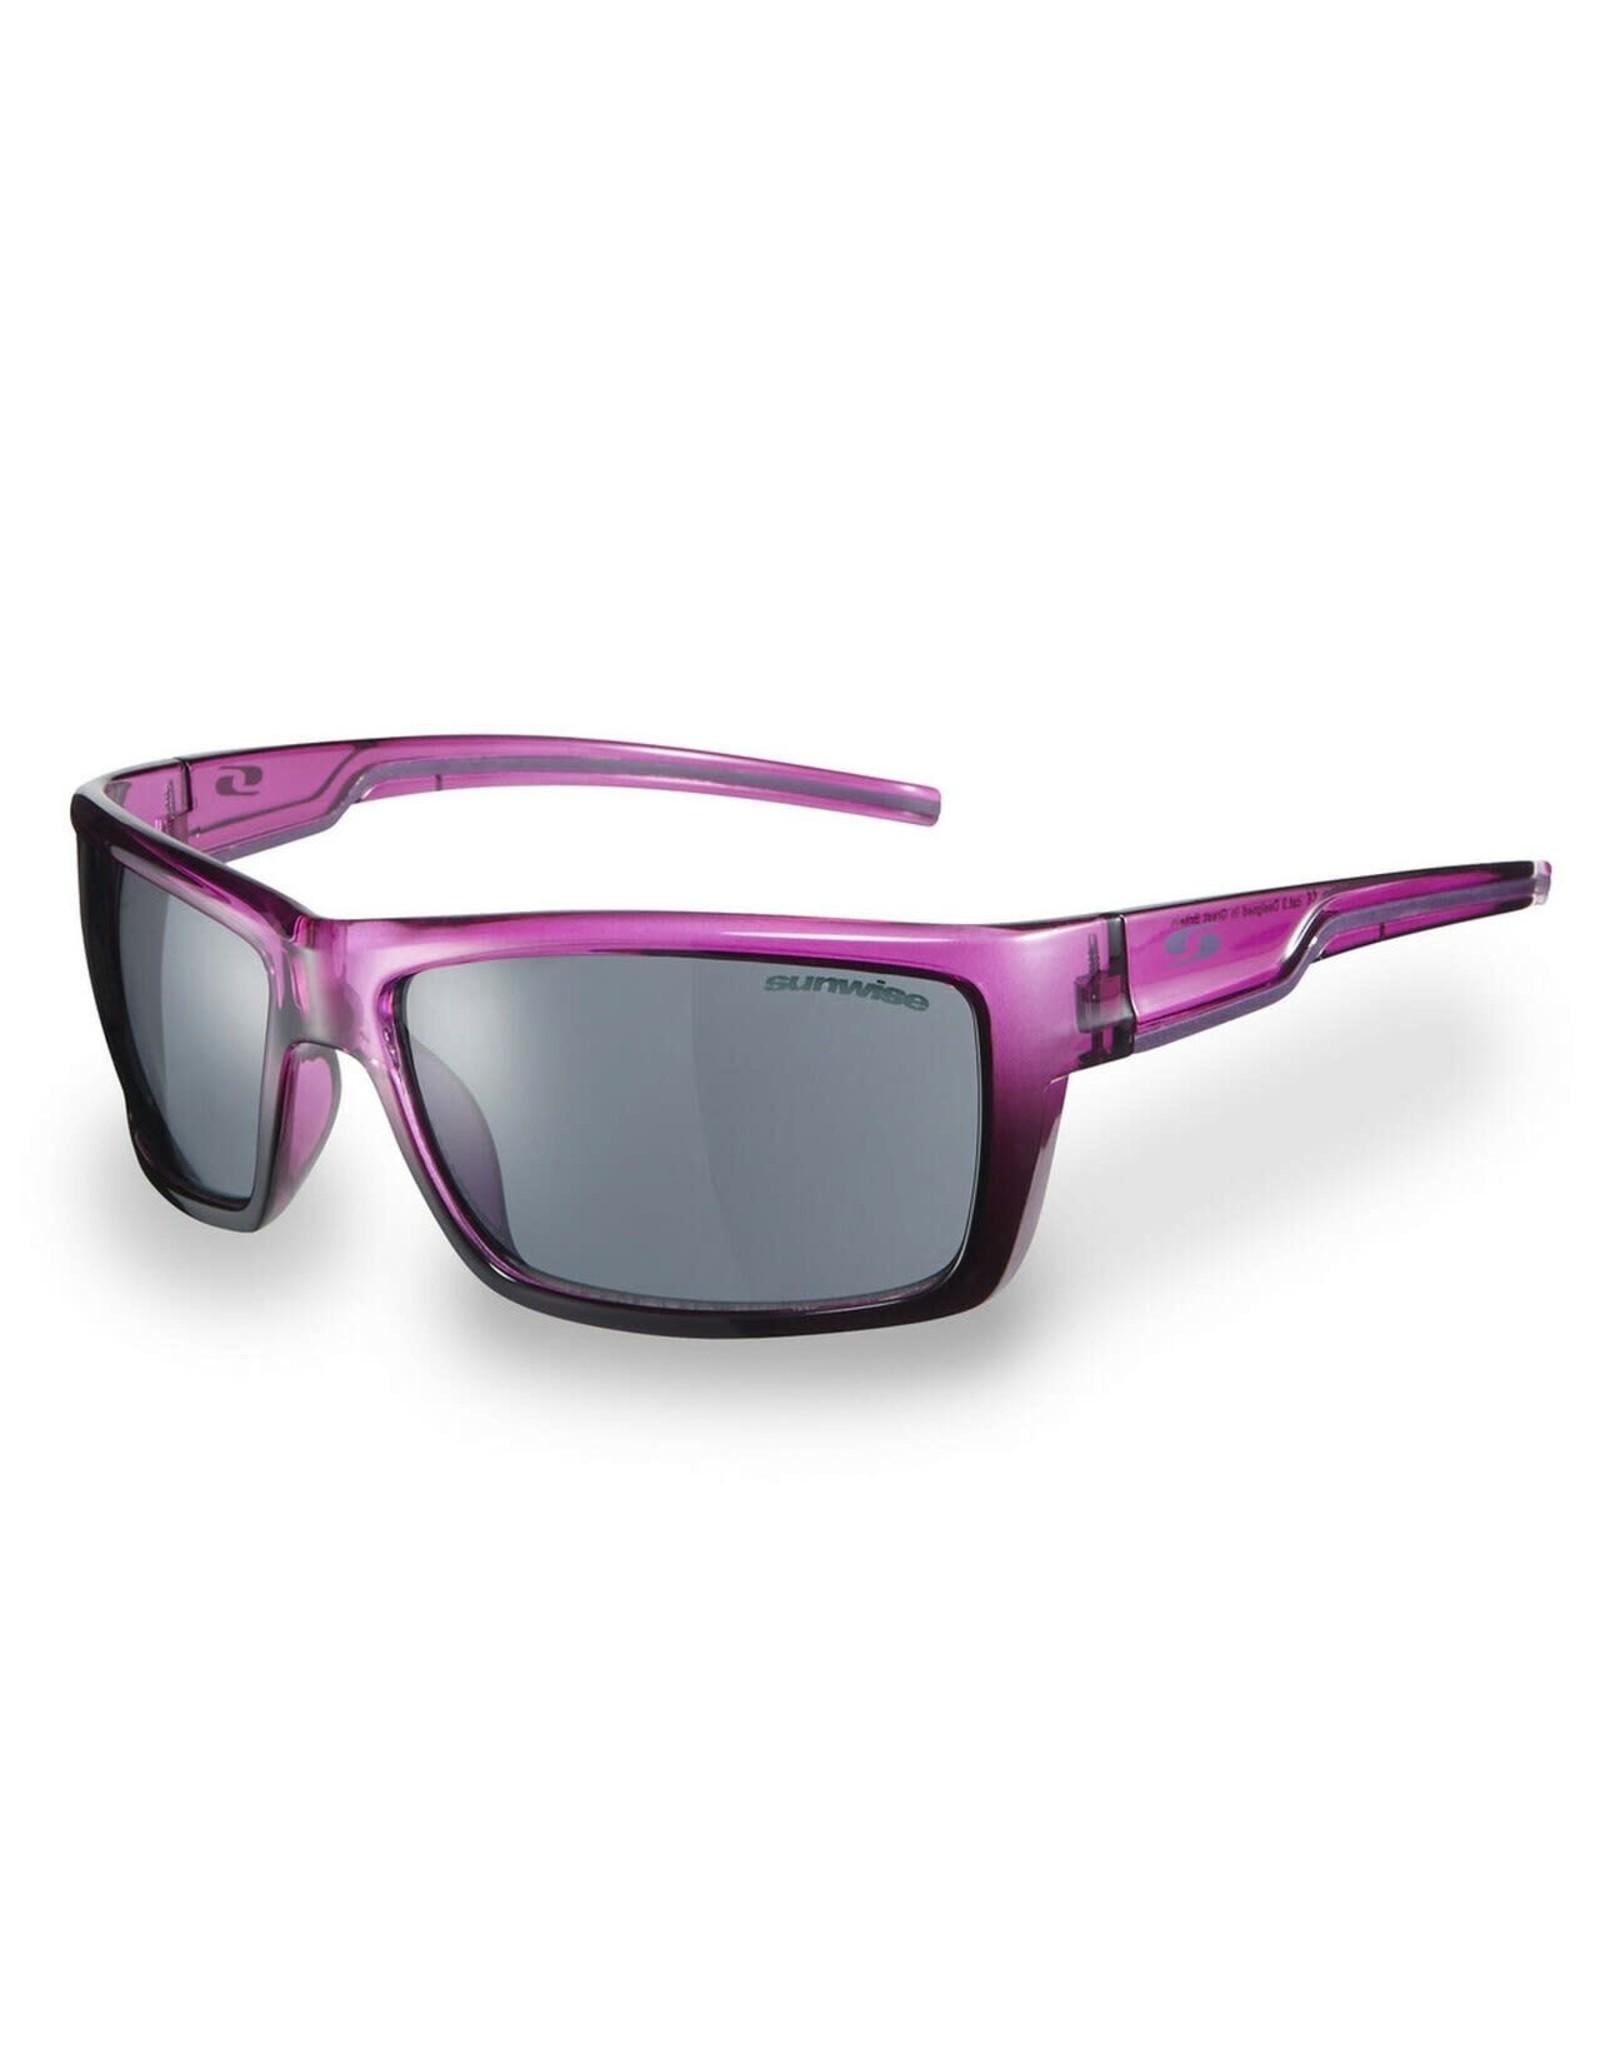 Sunwise Pioneer Retro Cycling Sunglasses